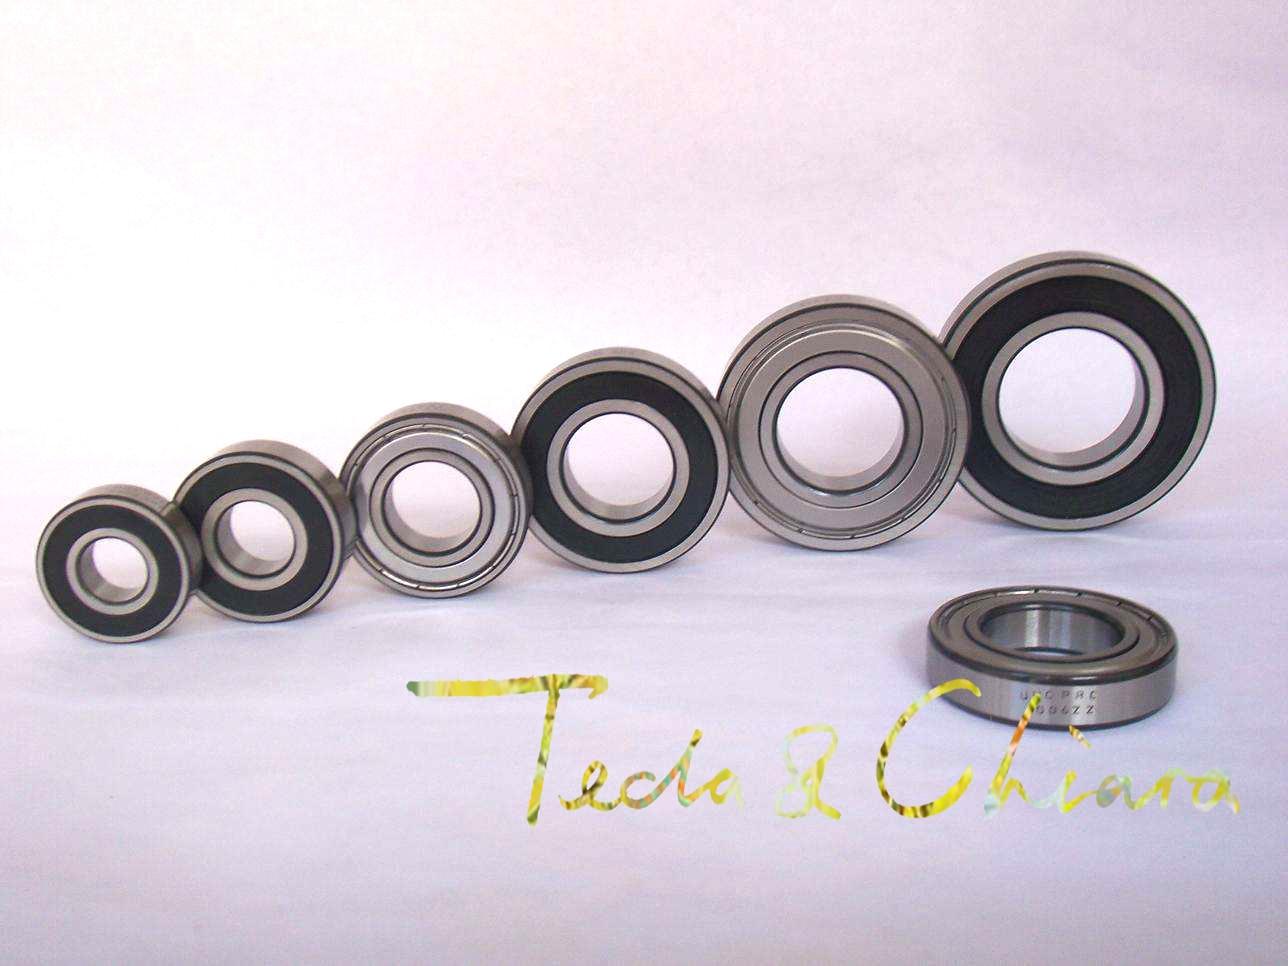 6201 6201ZZ 6201RS 6201-2Z 6201Z 6201-2RS ZZ RS RZ 2RZ Deep Groove Ball Bearings 12 x 32 x 10mm High Quality 6000 6000zz 6000rs 6000 2z 6000z 6000 2rs zz rs rz 2rz deep groove ball bearings 10 x 26 x 8mm high quality